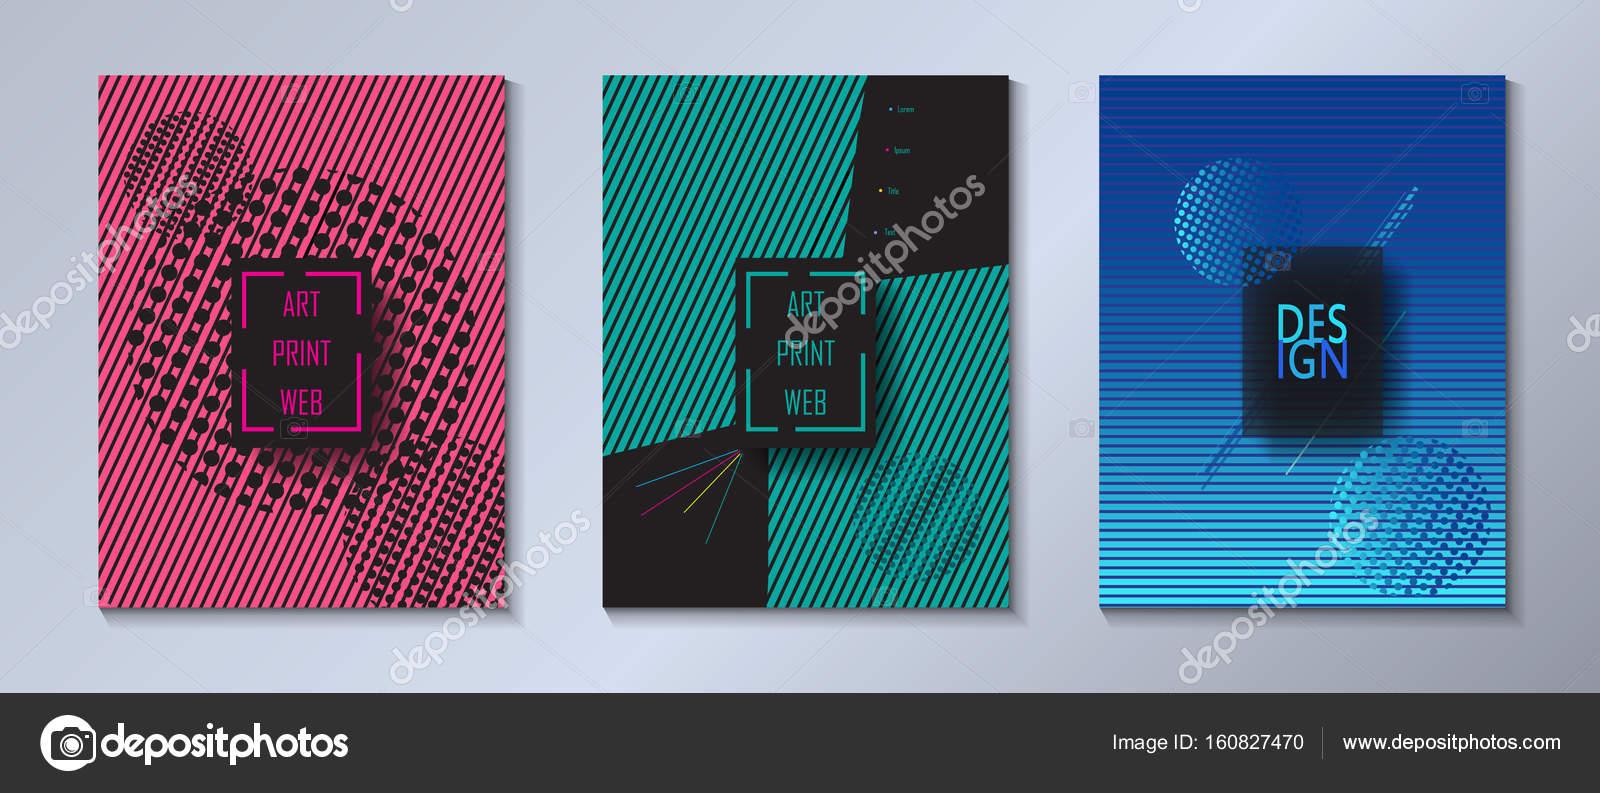 Abstrakt Pop Art. Moderne Kunst Design Ausstellung Galerie Katalog ...